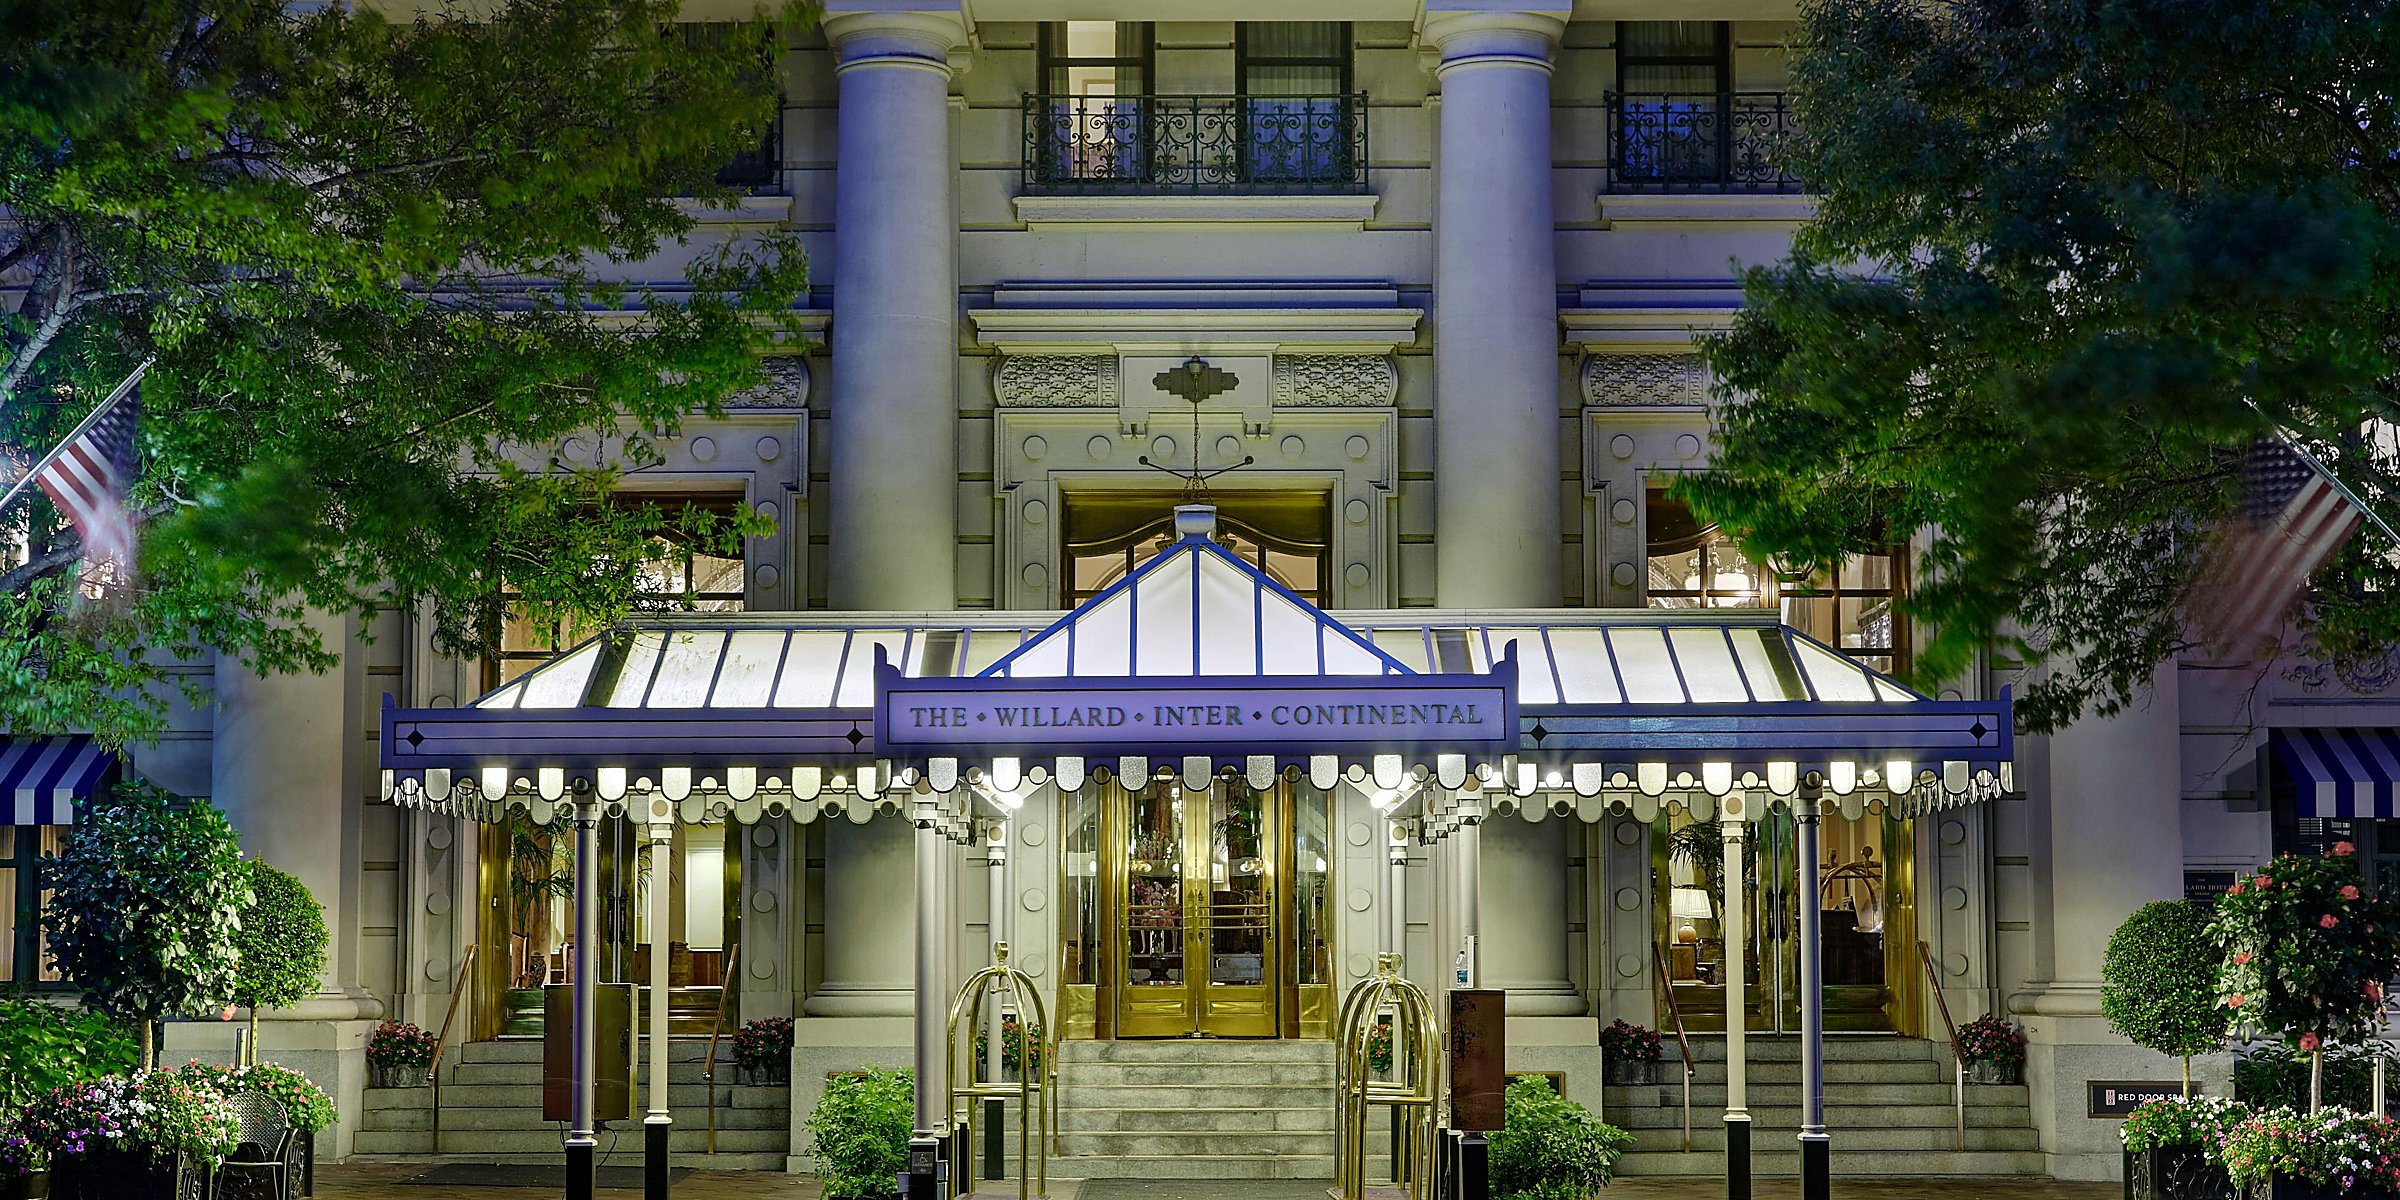 Luxury DC Hotels near the White House   InterContinental The Willard